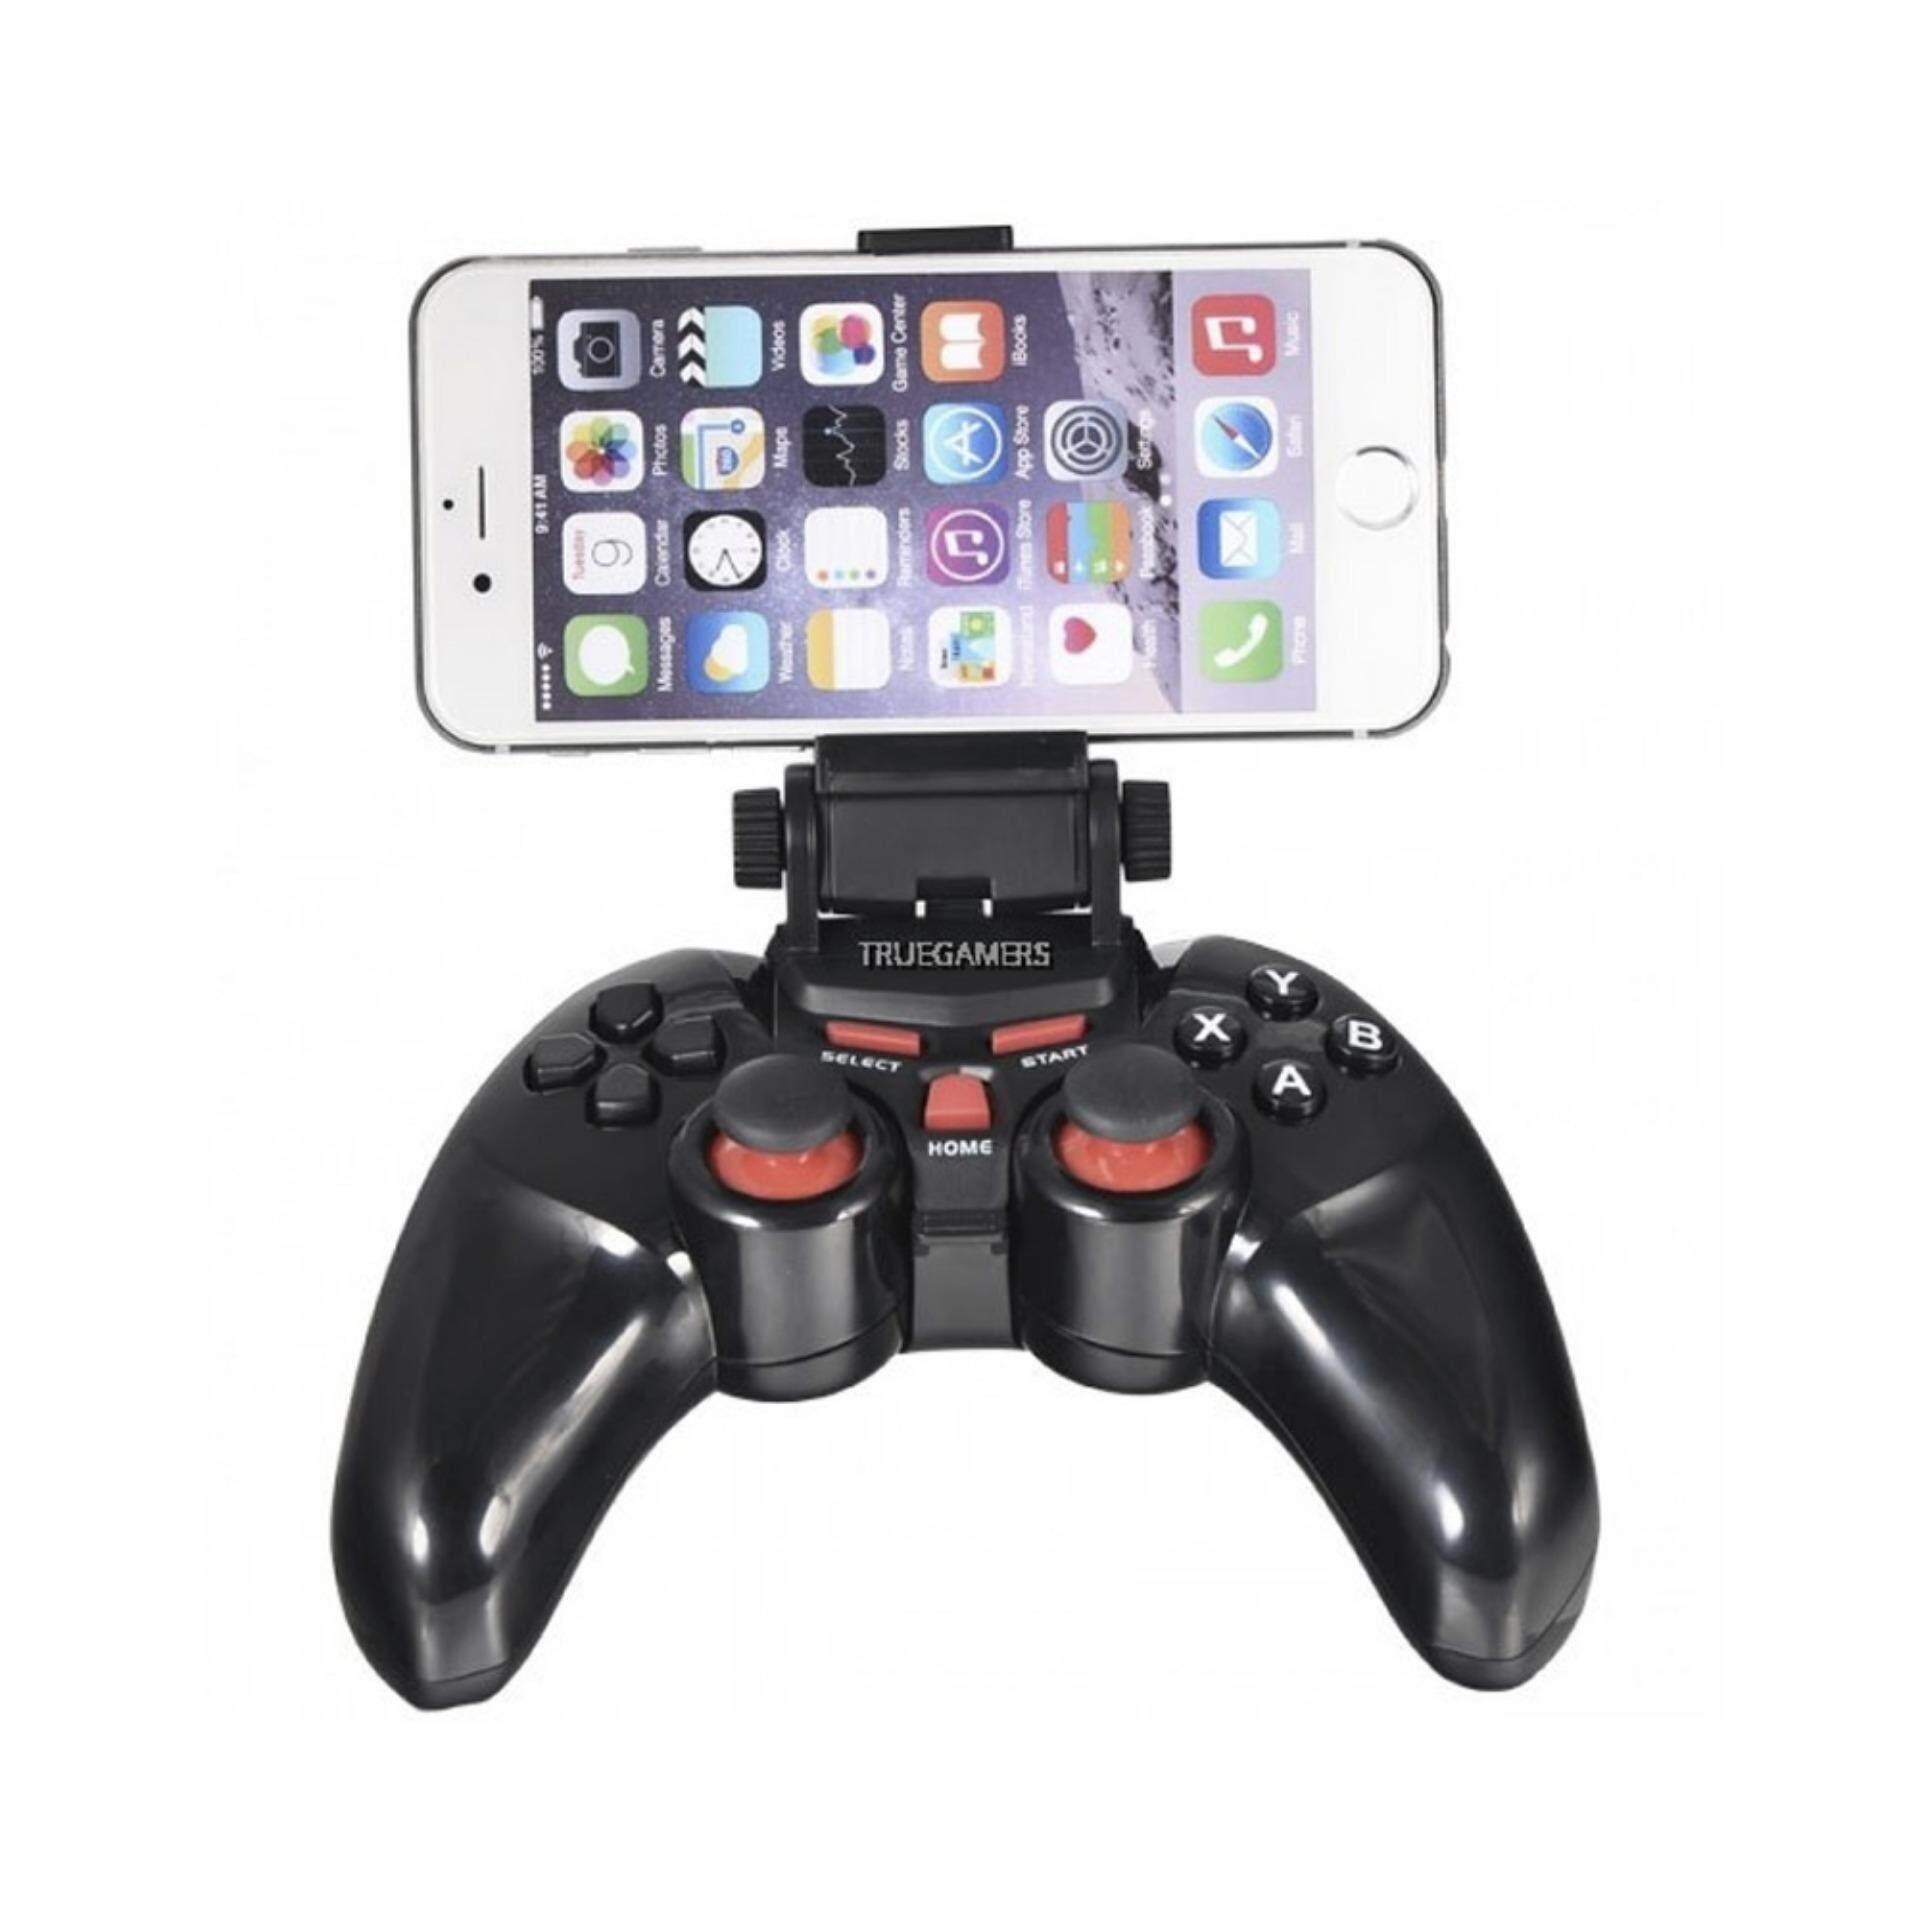 Features Sa Yanyi Dobe Bluetooth Gamepad It 465 Dan Harga Terbaru Hp Android Ios Ti Wireless Game Controller Joystick Gaming With Clamp Holder For